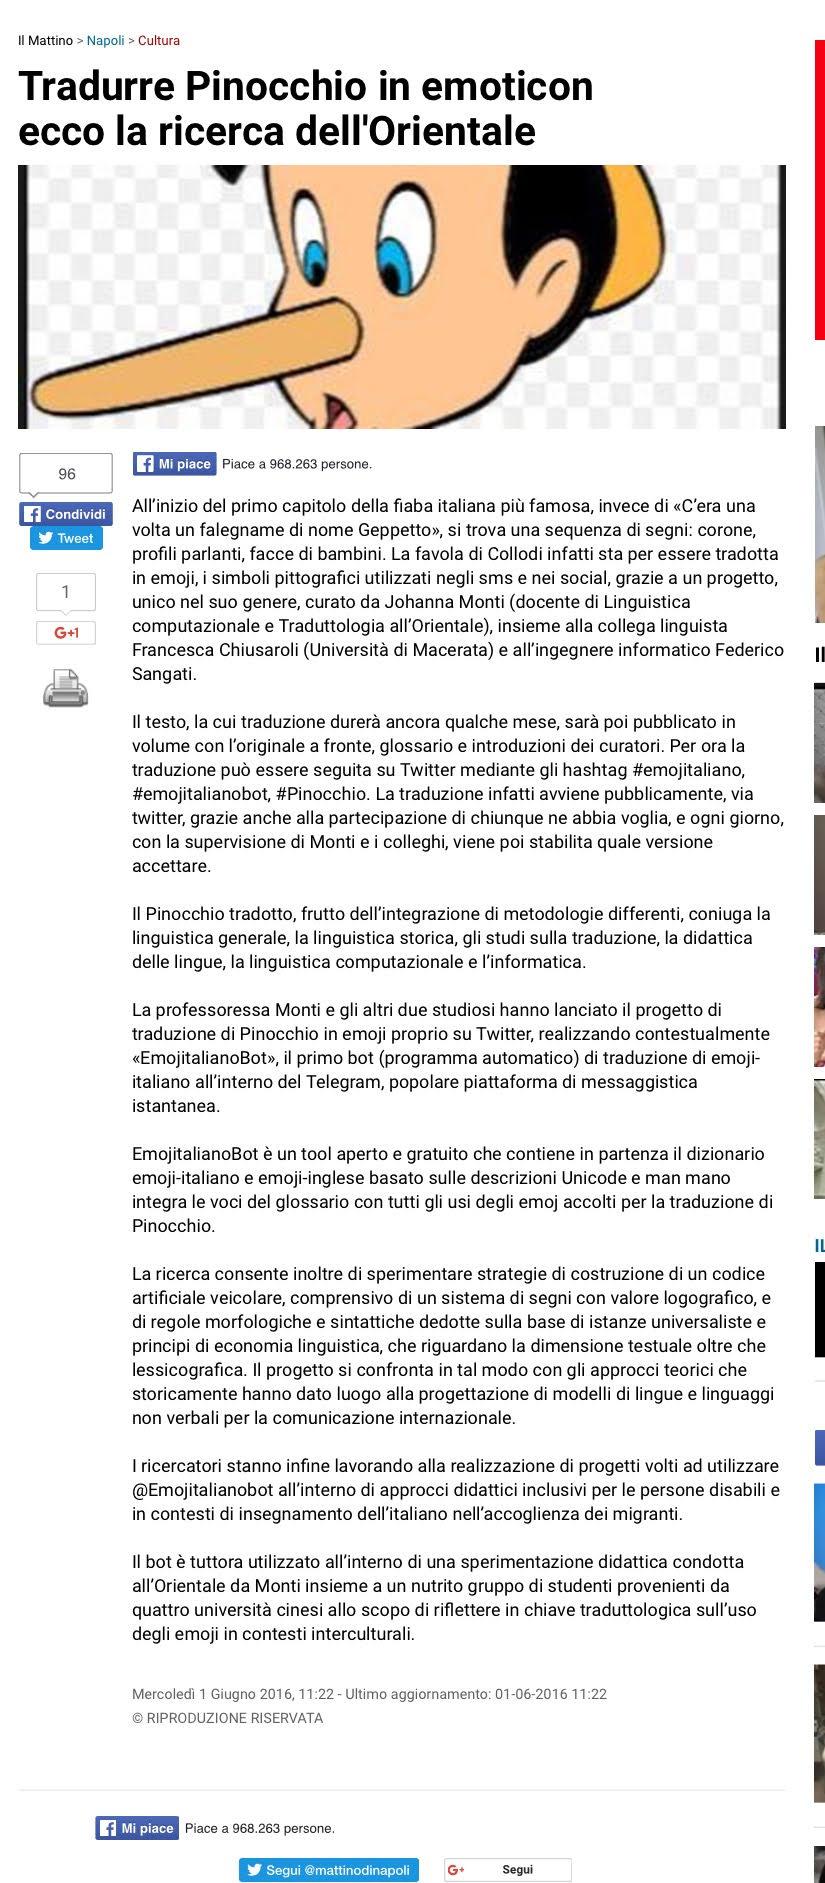 Pinocchio_ilMattino